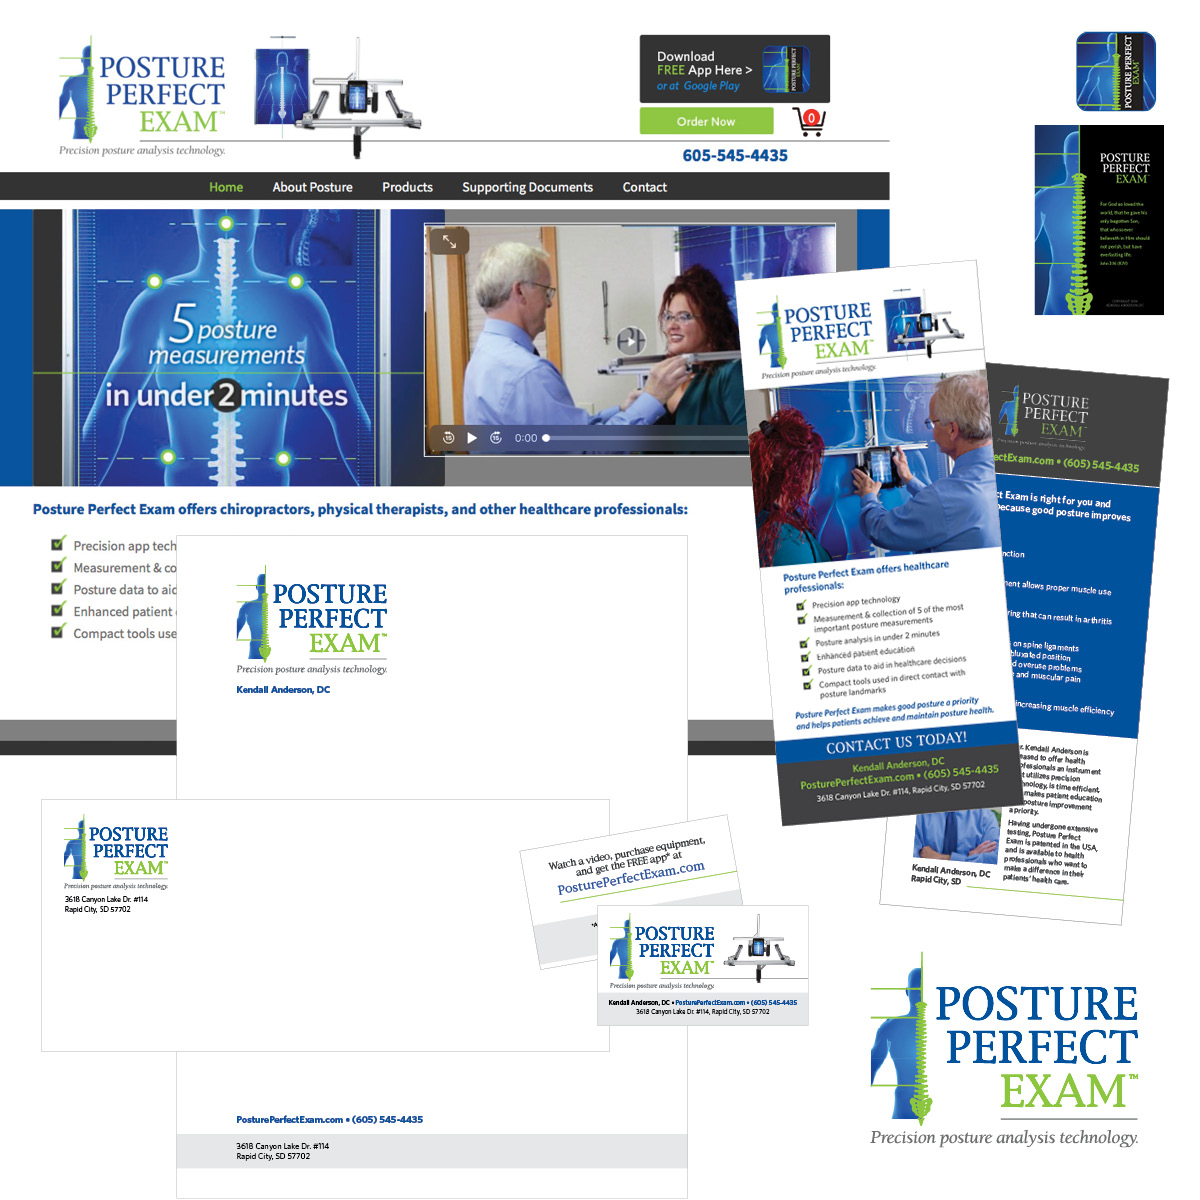 Posture Perfect Exam Identity